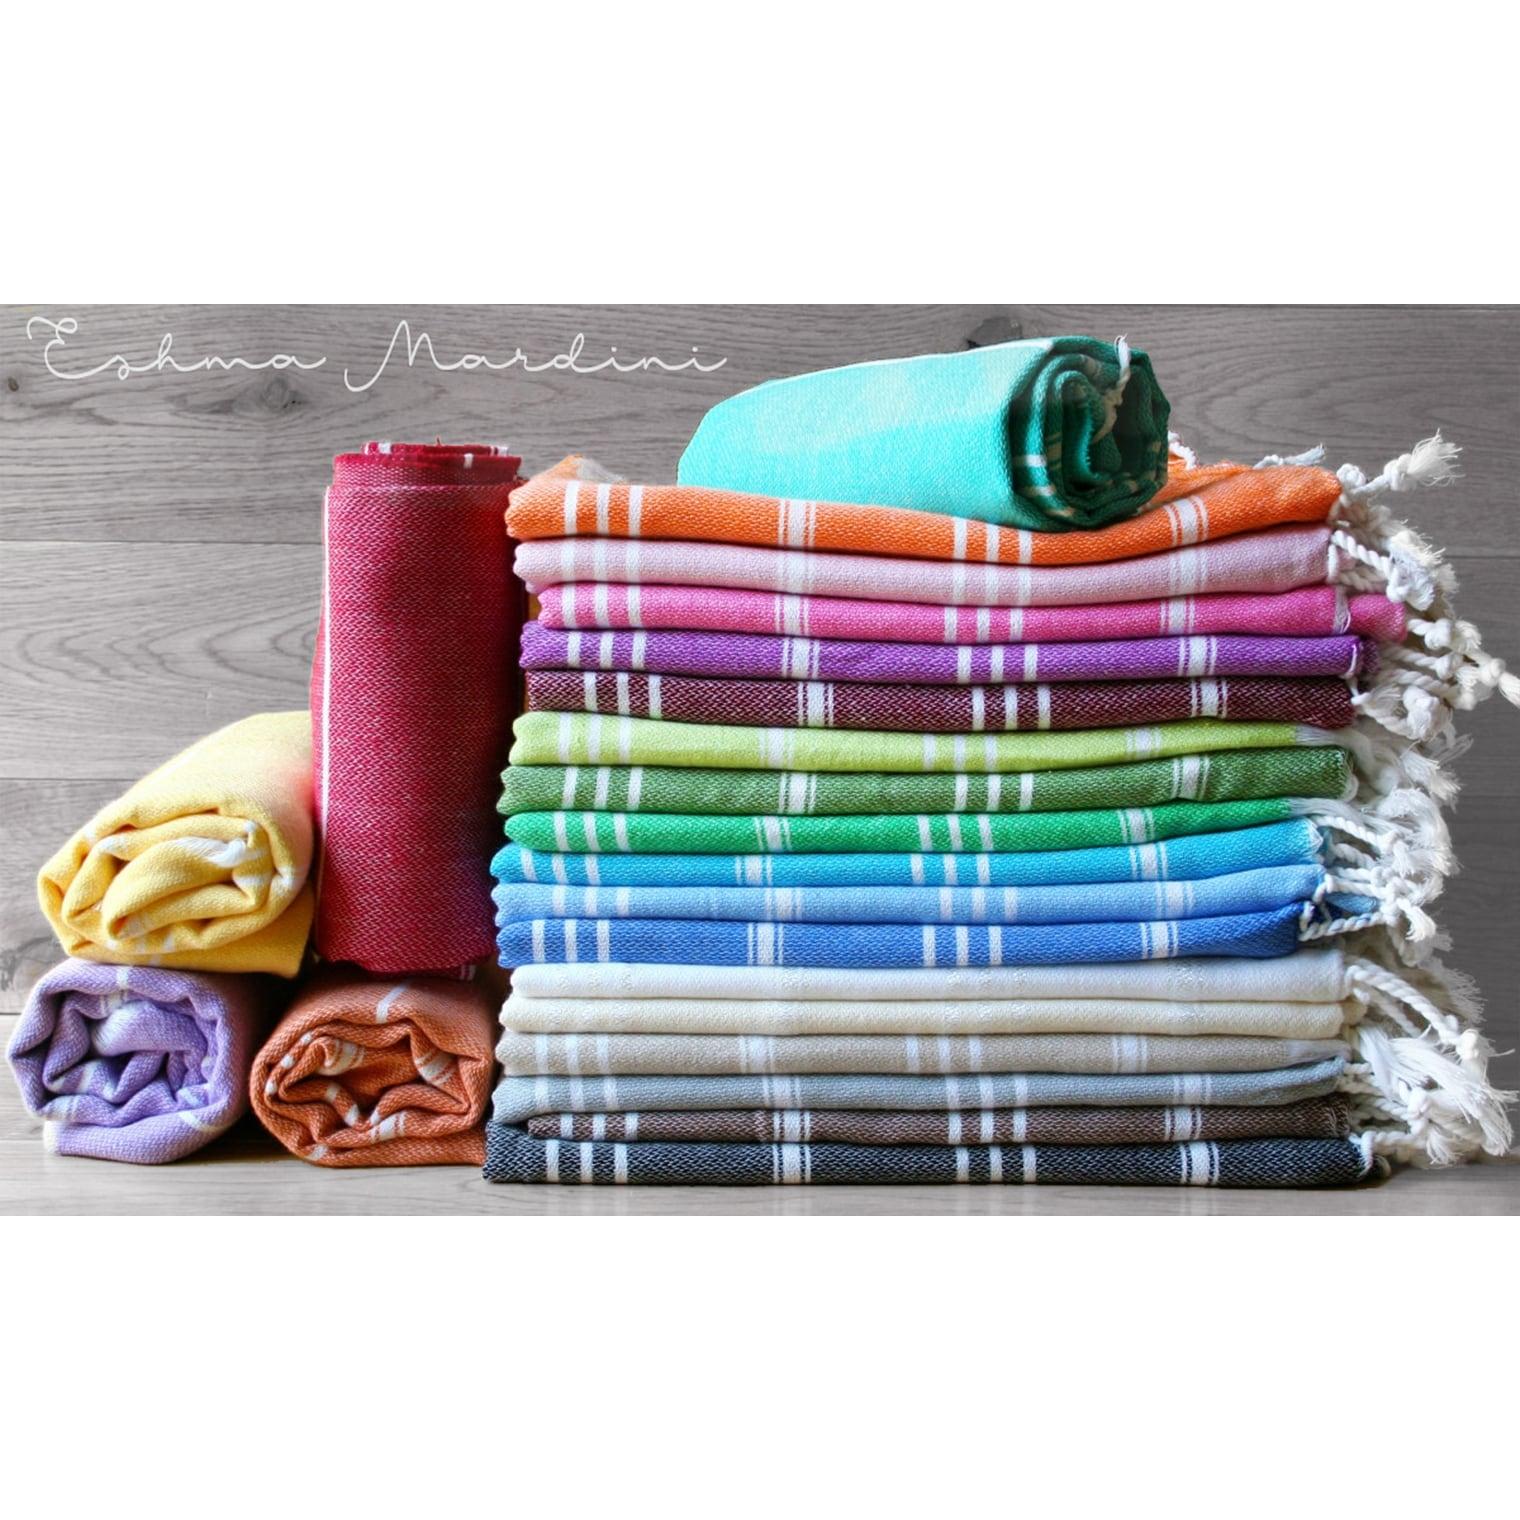 "Swan Comfort Cotton Swimsuit Cover Up & Bath Beach Travel Towel - 39"" x 70"" - Thumbnail 0"